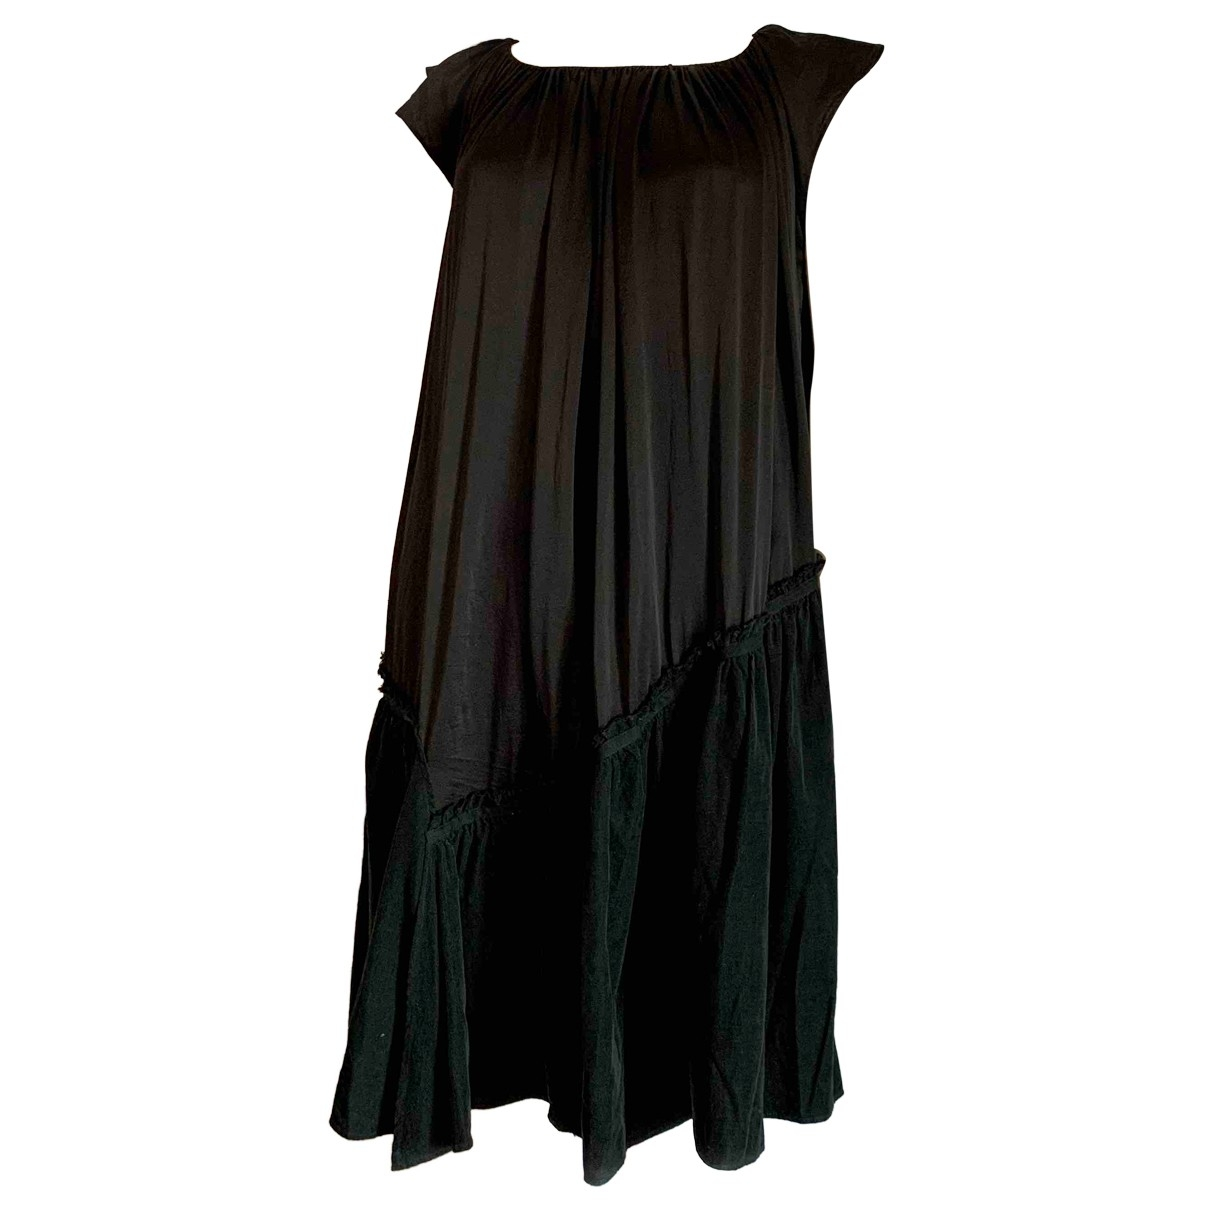 8pm \N Black Silk dress for Women M International